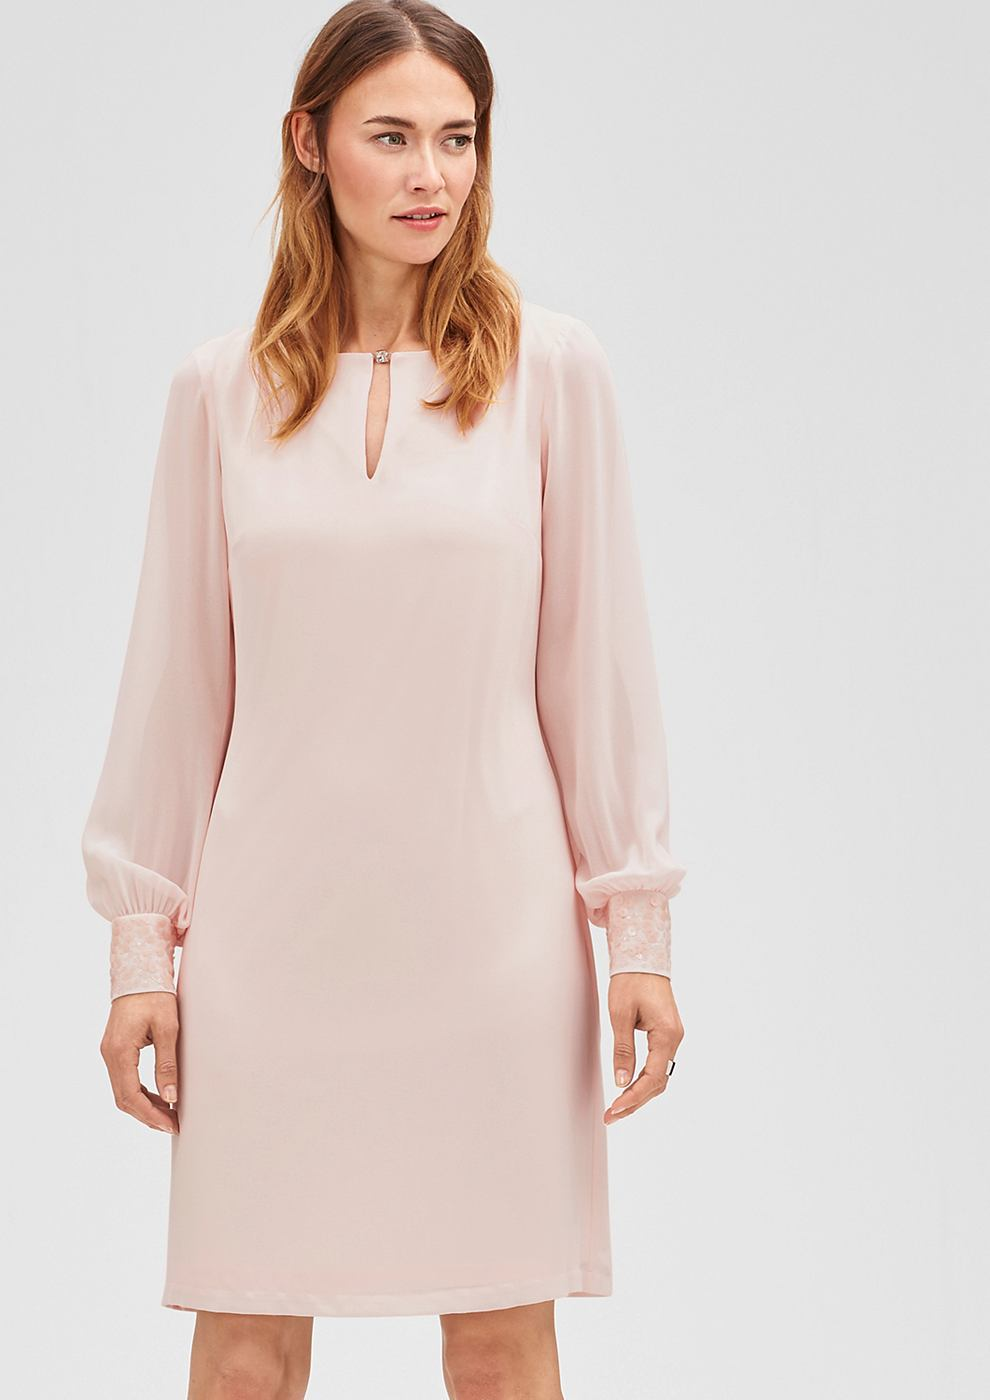 s.Oliver Premium Elegante jurk van chiffon rood